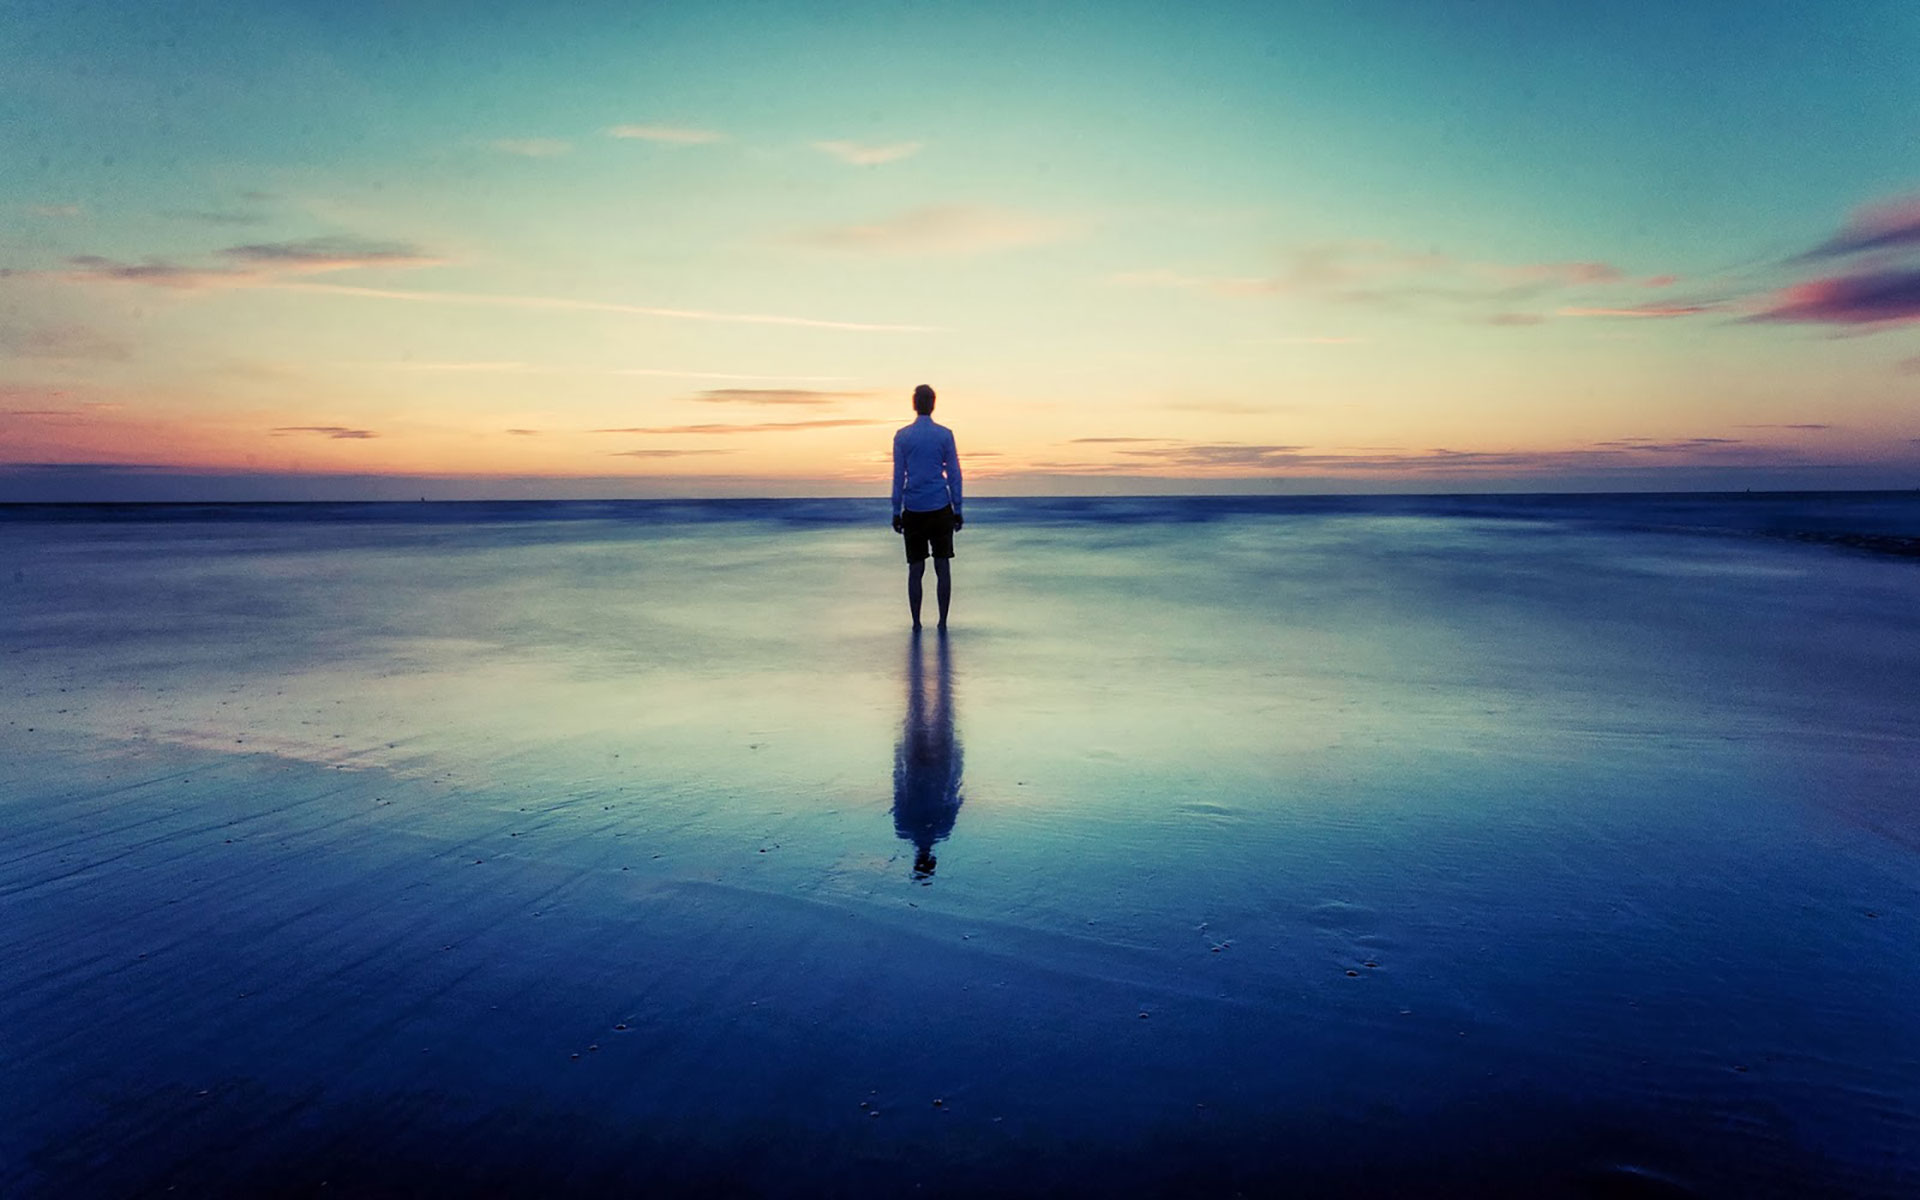 Alone Sad Boy Standing